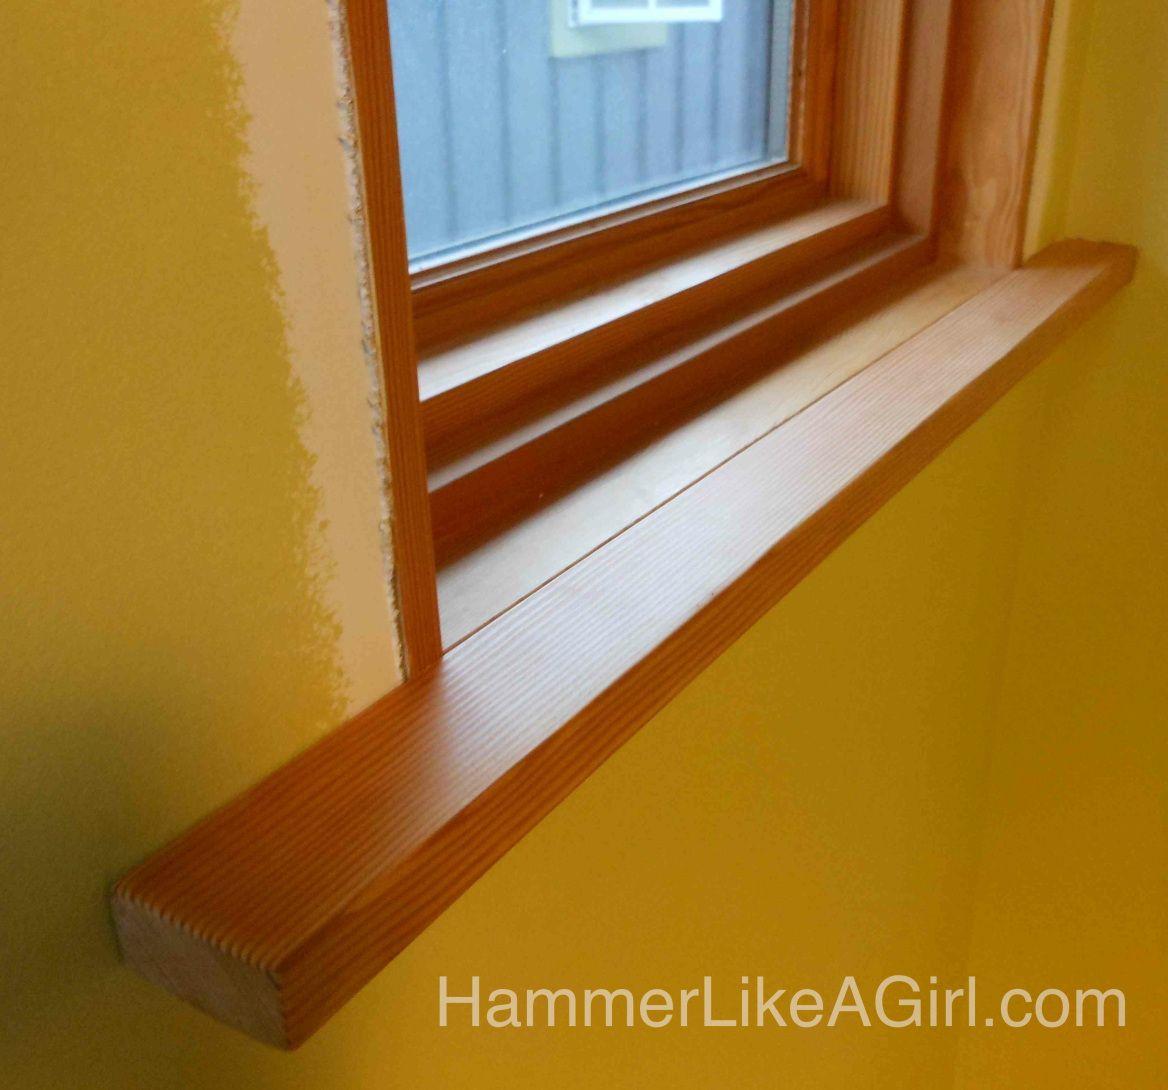 Installing Craftsman Window Trim Finally In 2020 Craftsman Window Trim Window Trim Craftsman Windows